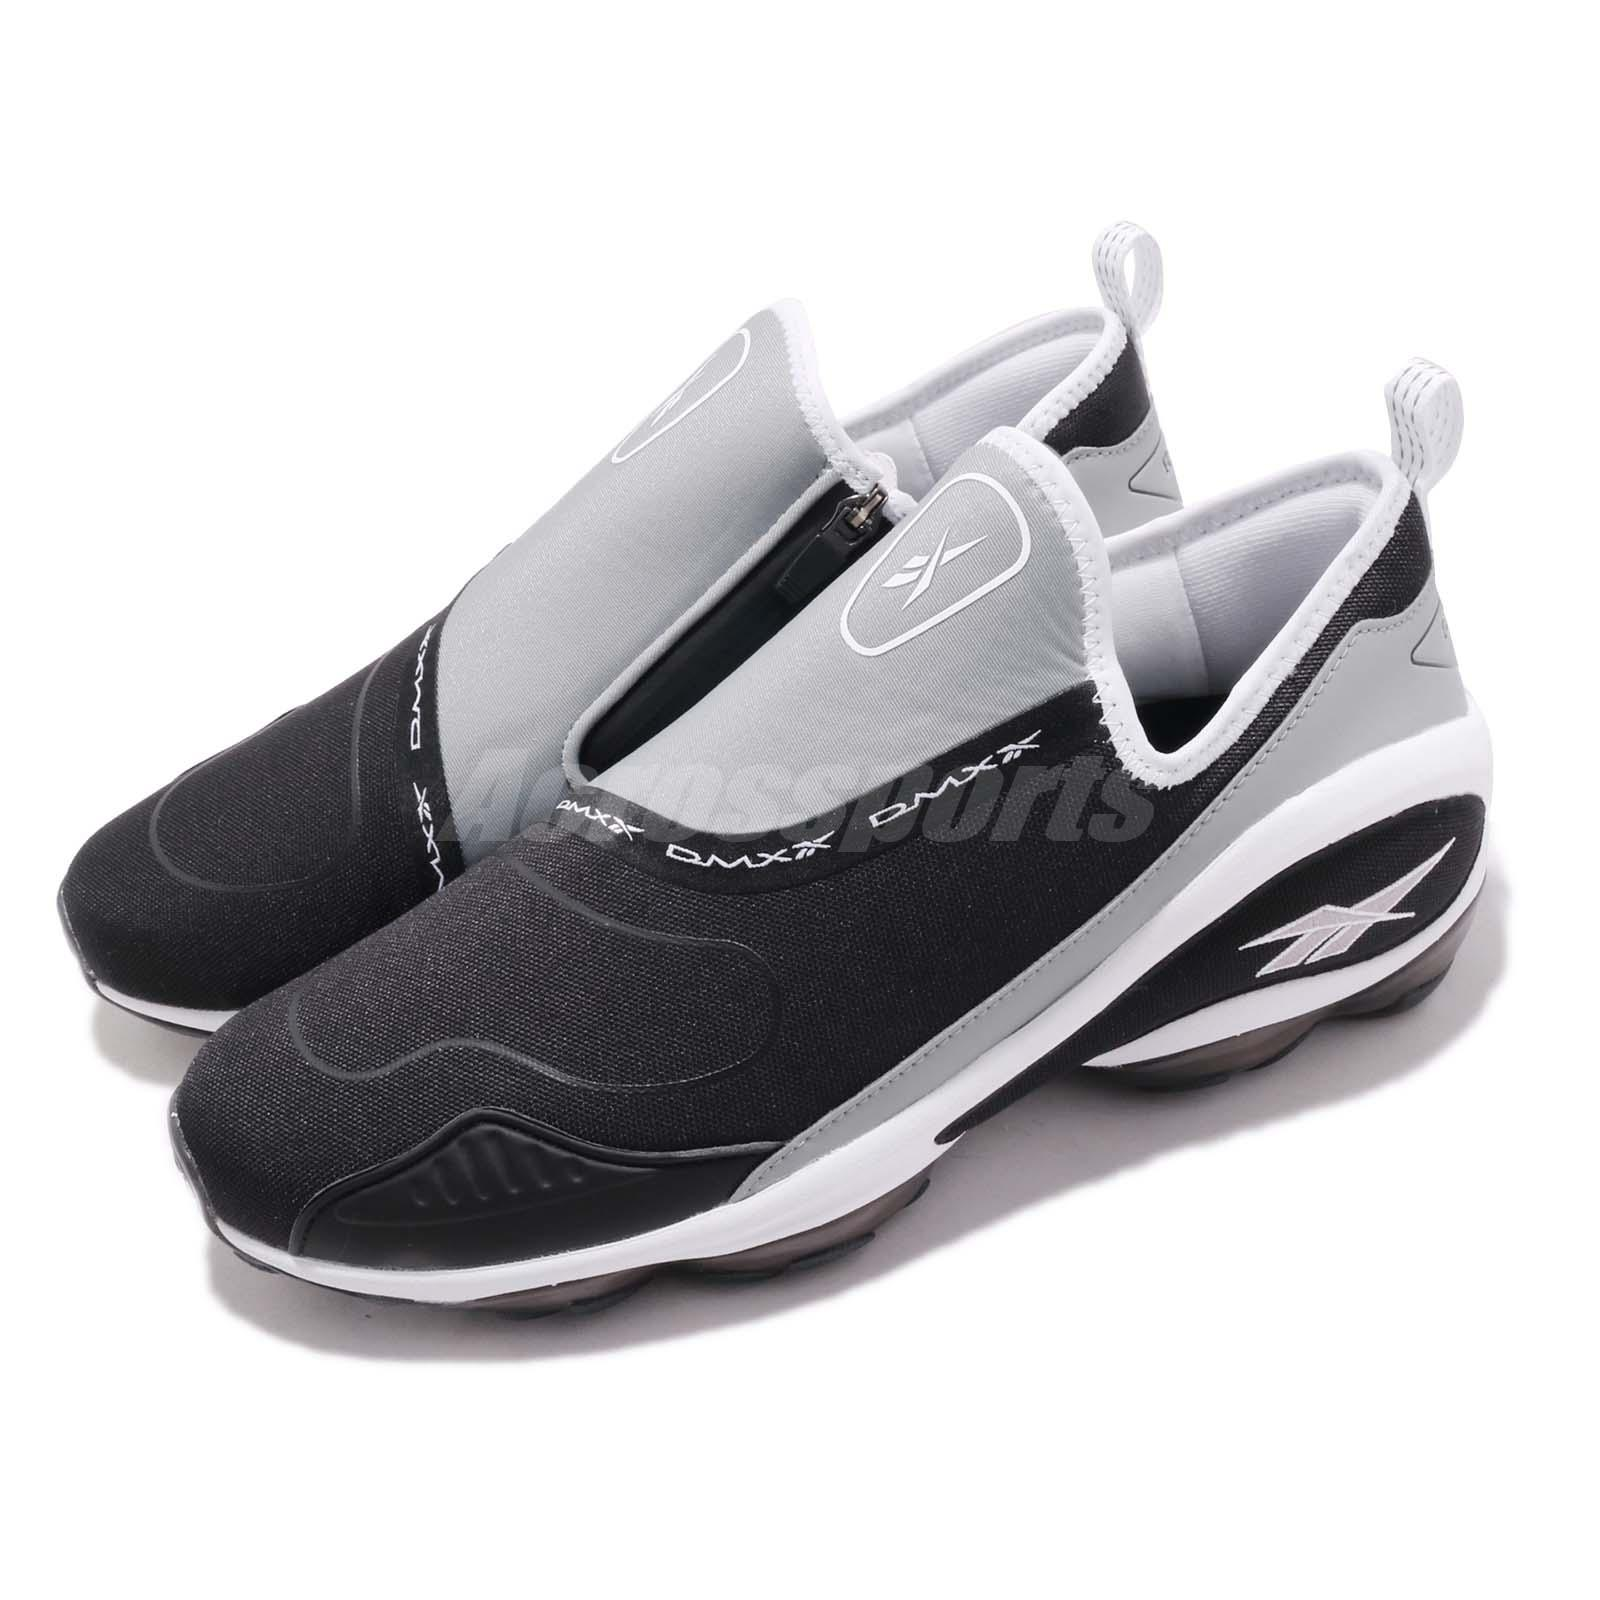 ba47235351 Details about Reebok DMX Run 10 Slip On Black White Grey Zipper Men Running  Shoes CN4036